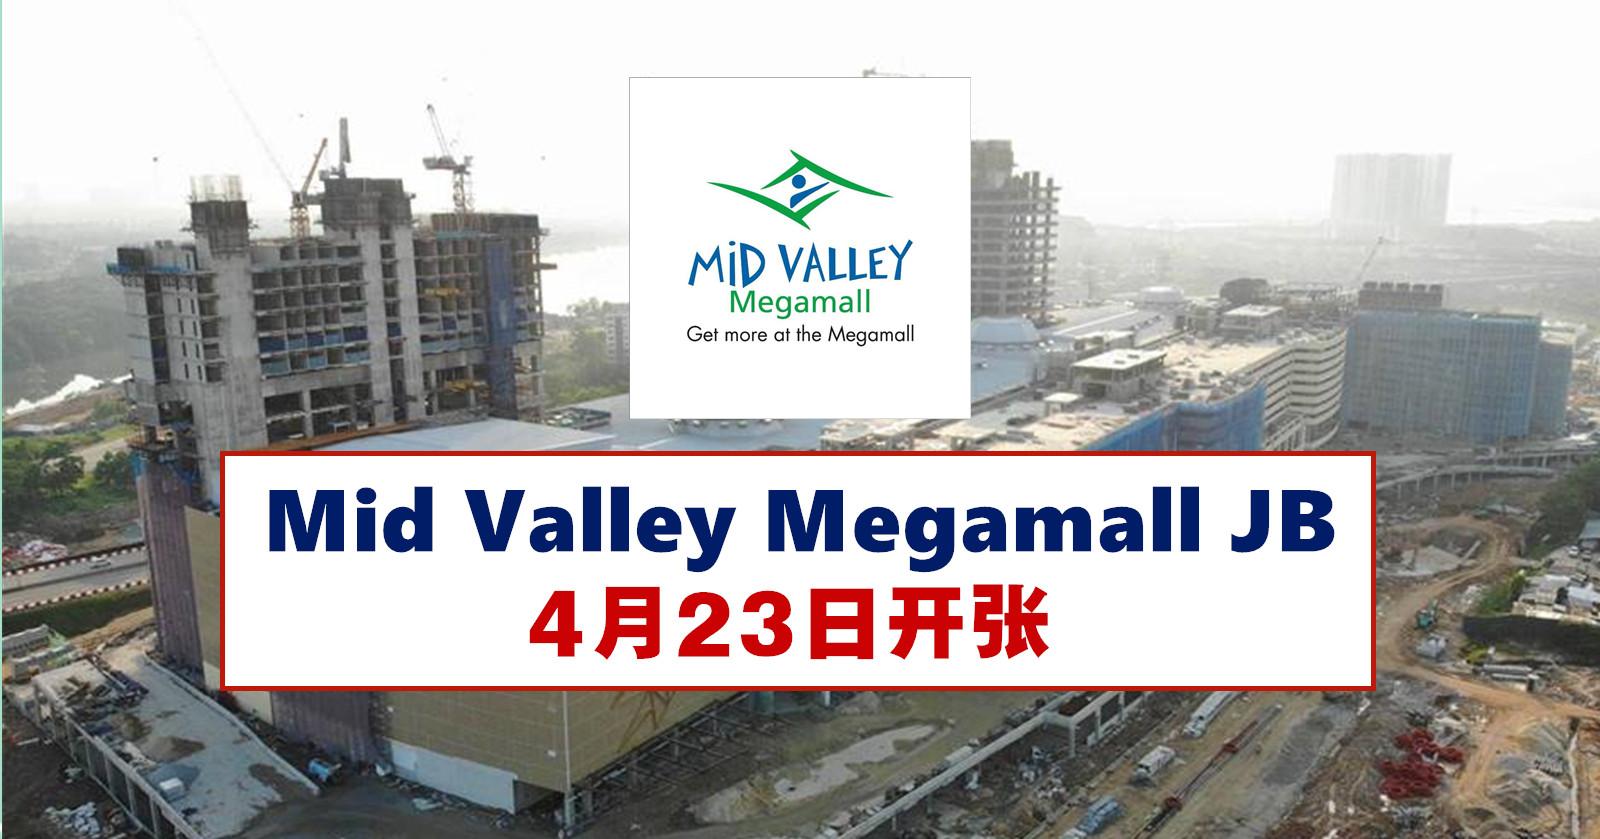 Mid Valley Megamall Johor Bahru 4月23日开张